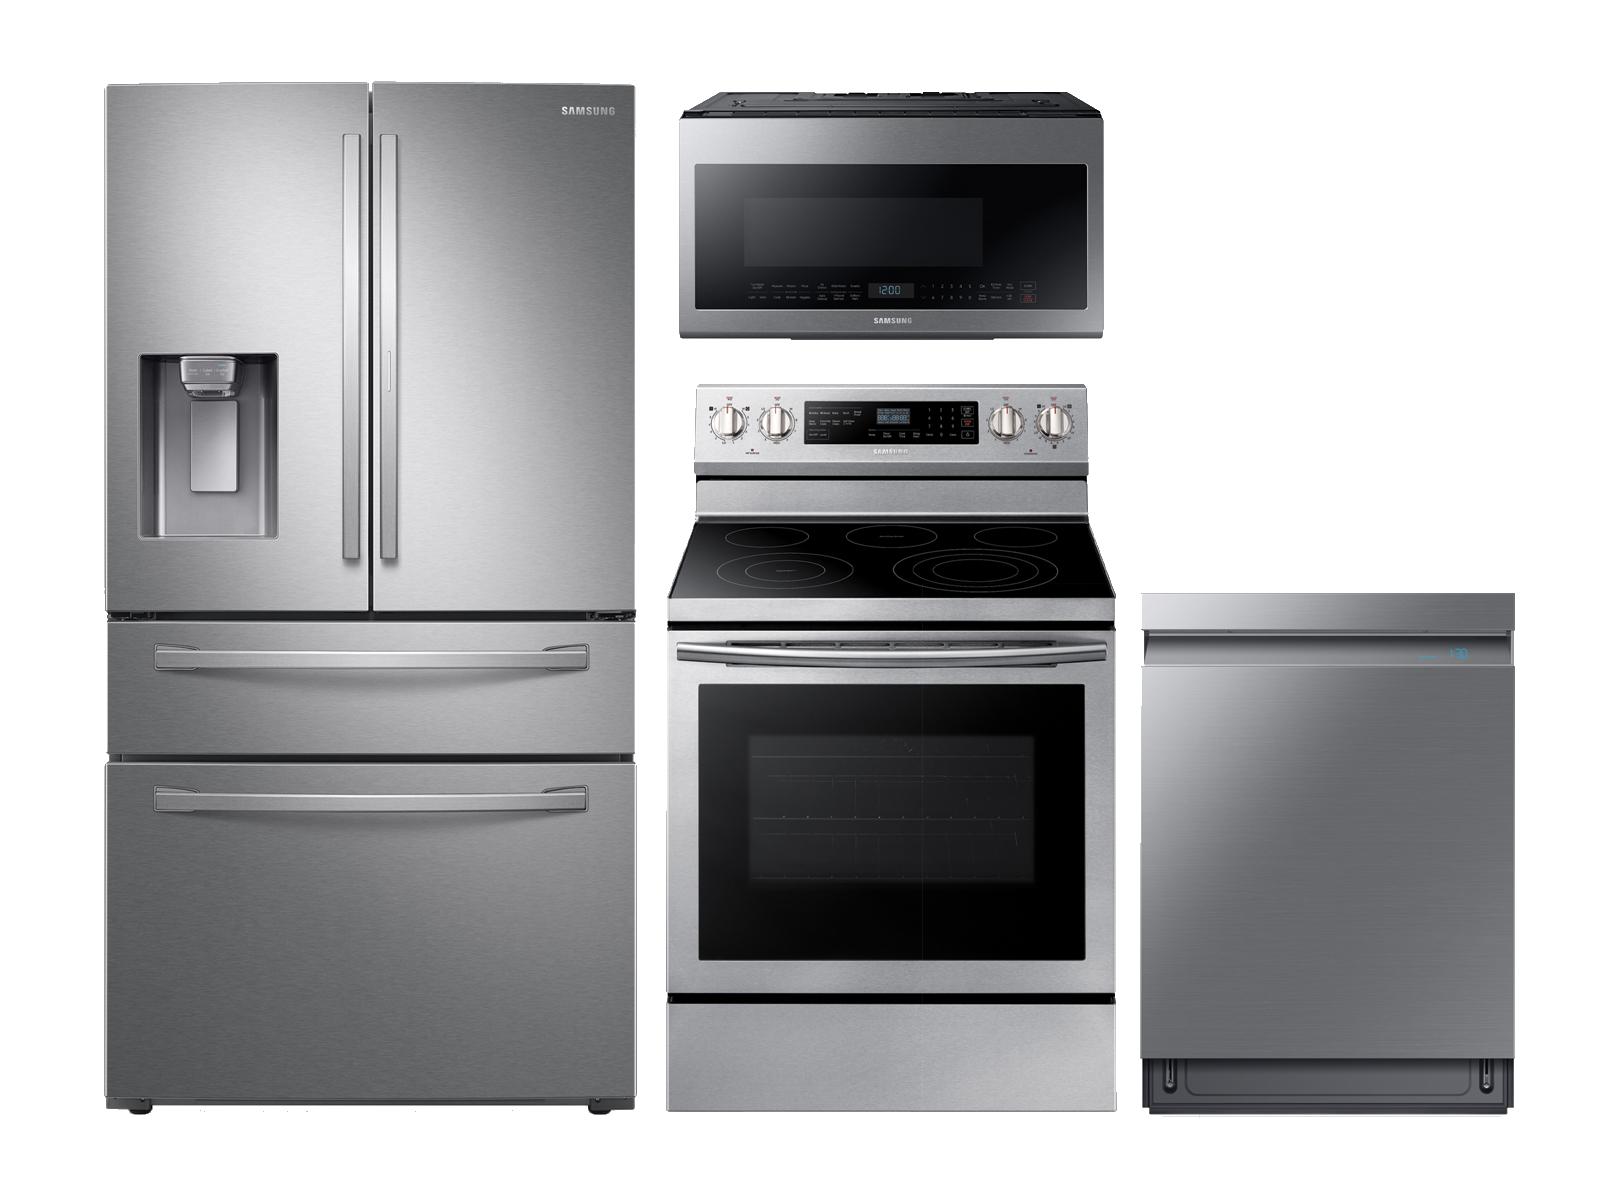 Samsung 4-door Refrigerator + Electric Range + Linear Wash Dishwasher + Microwave Kitchen Package in Stainless Steel